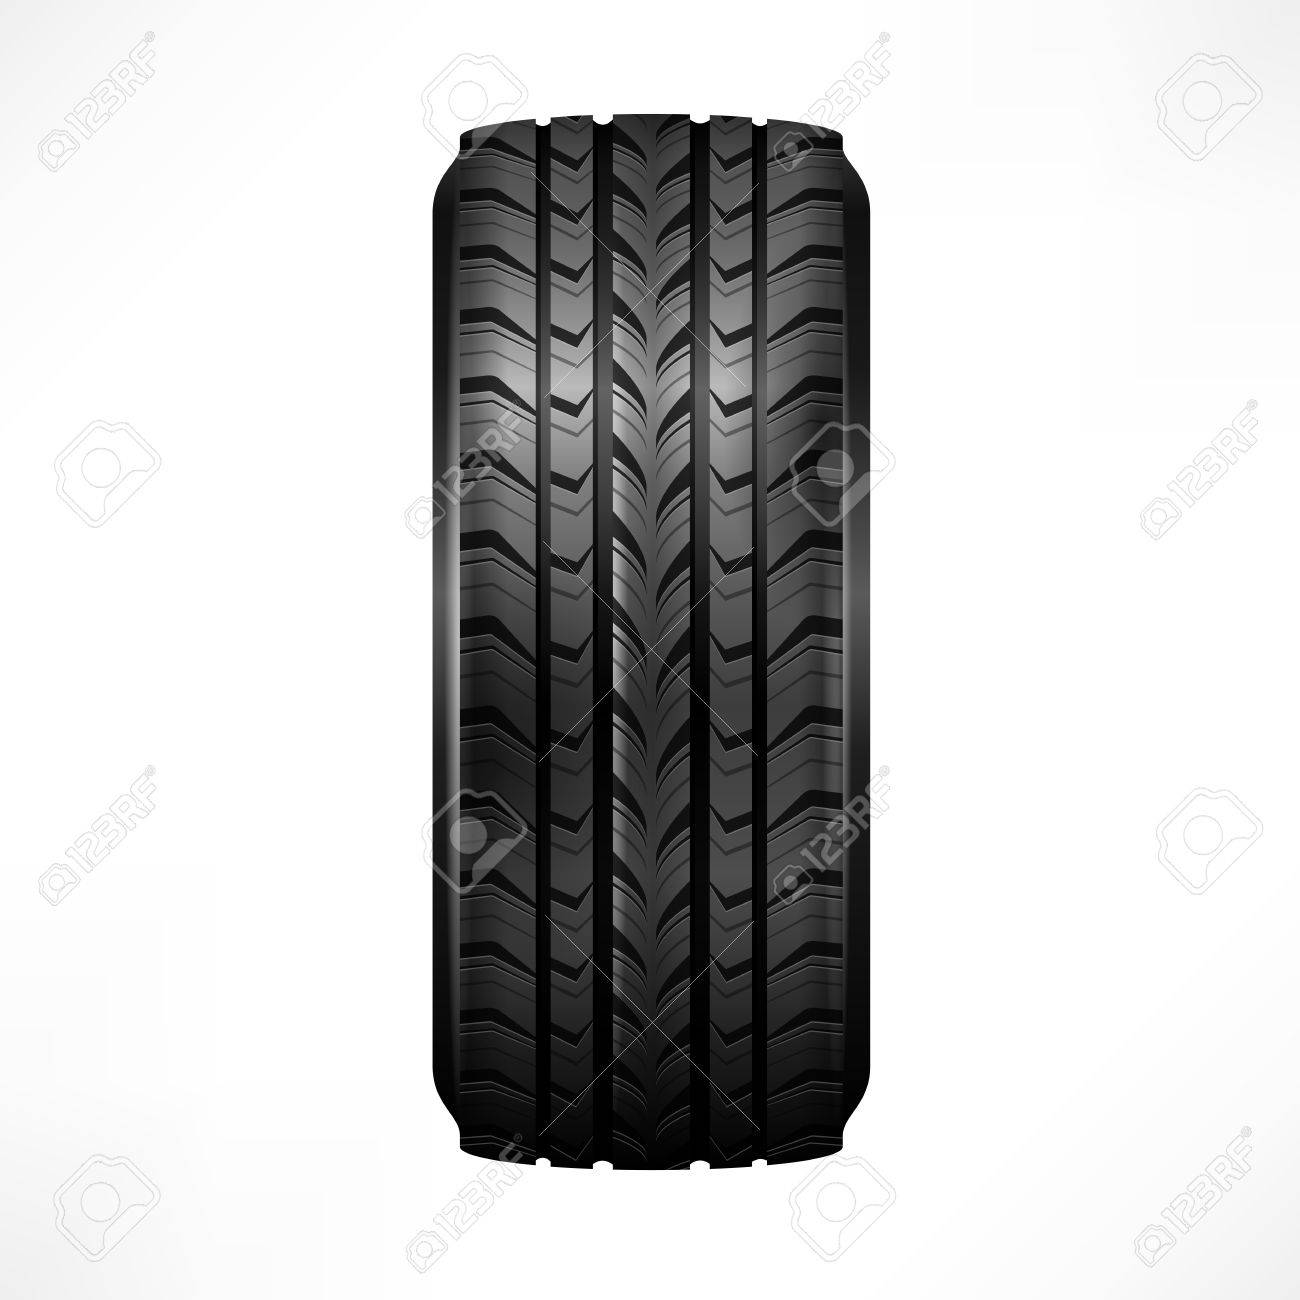 Black rubber tire on white background, vector illustration Stock Vector - 23112090